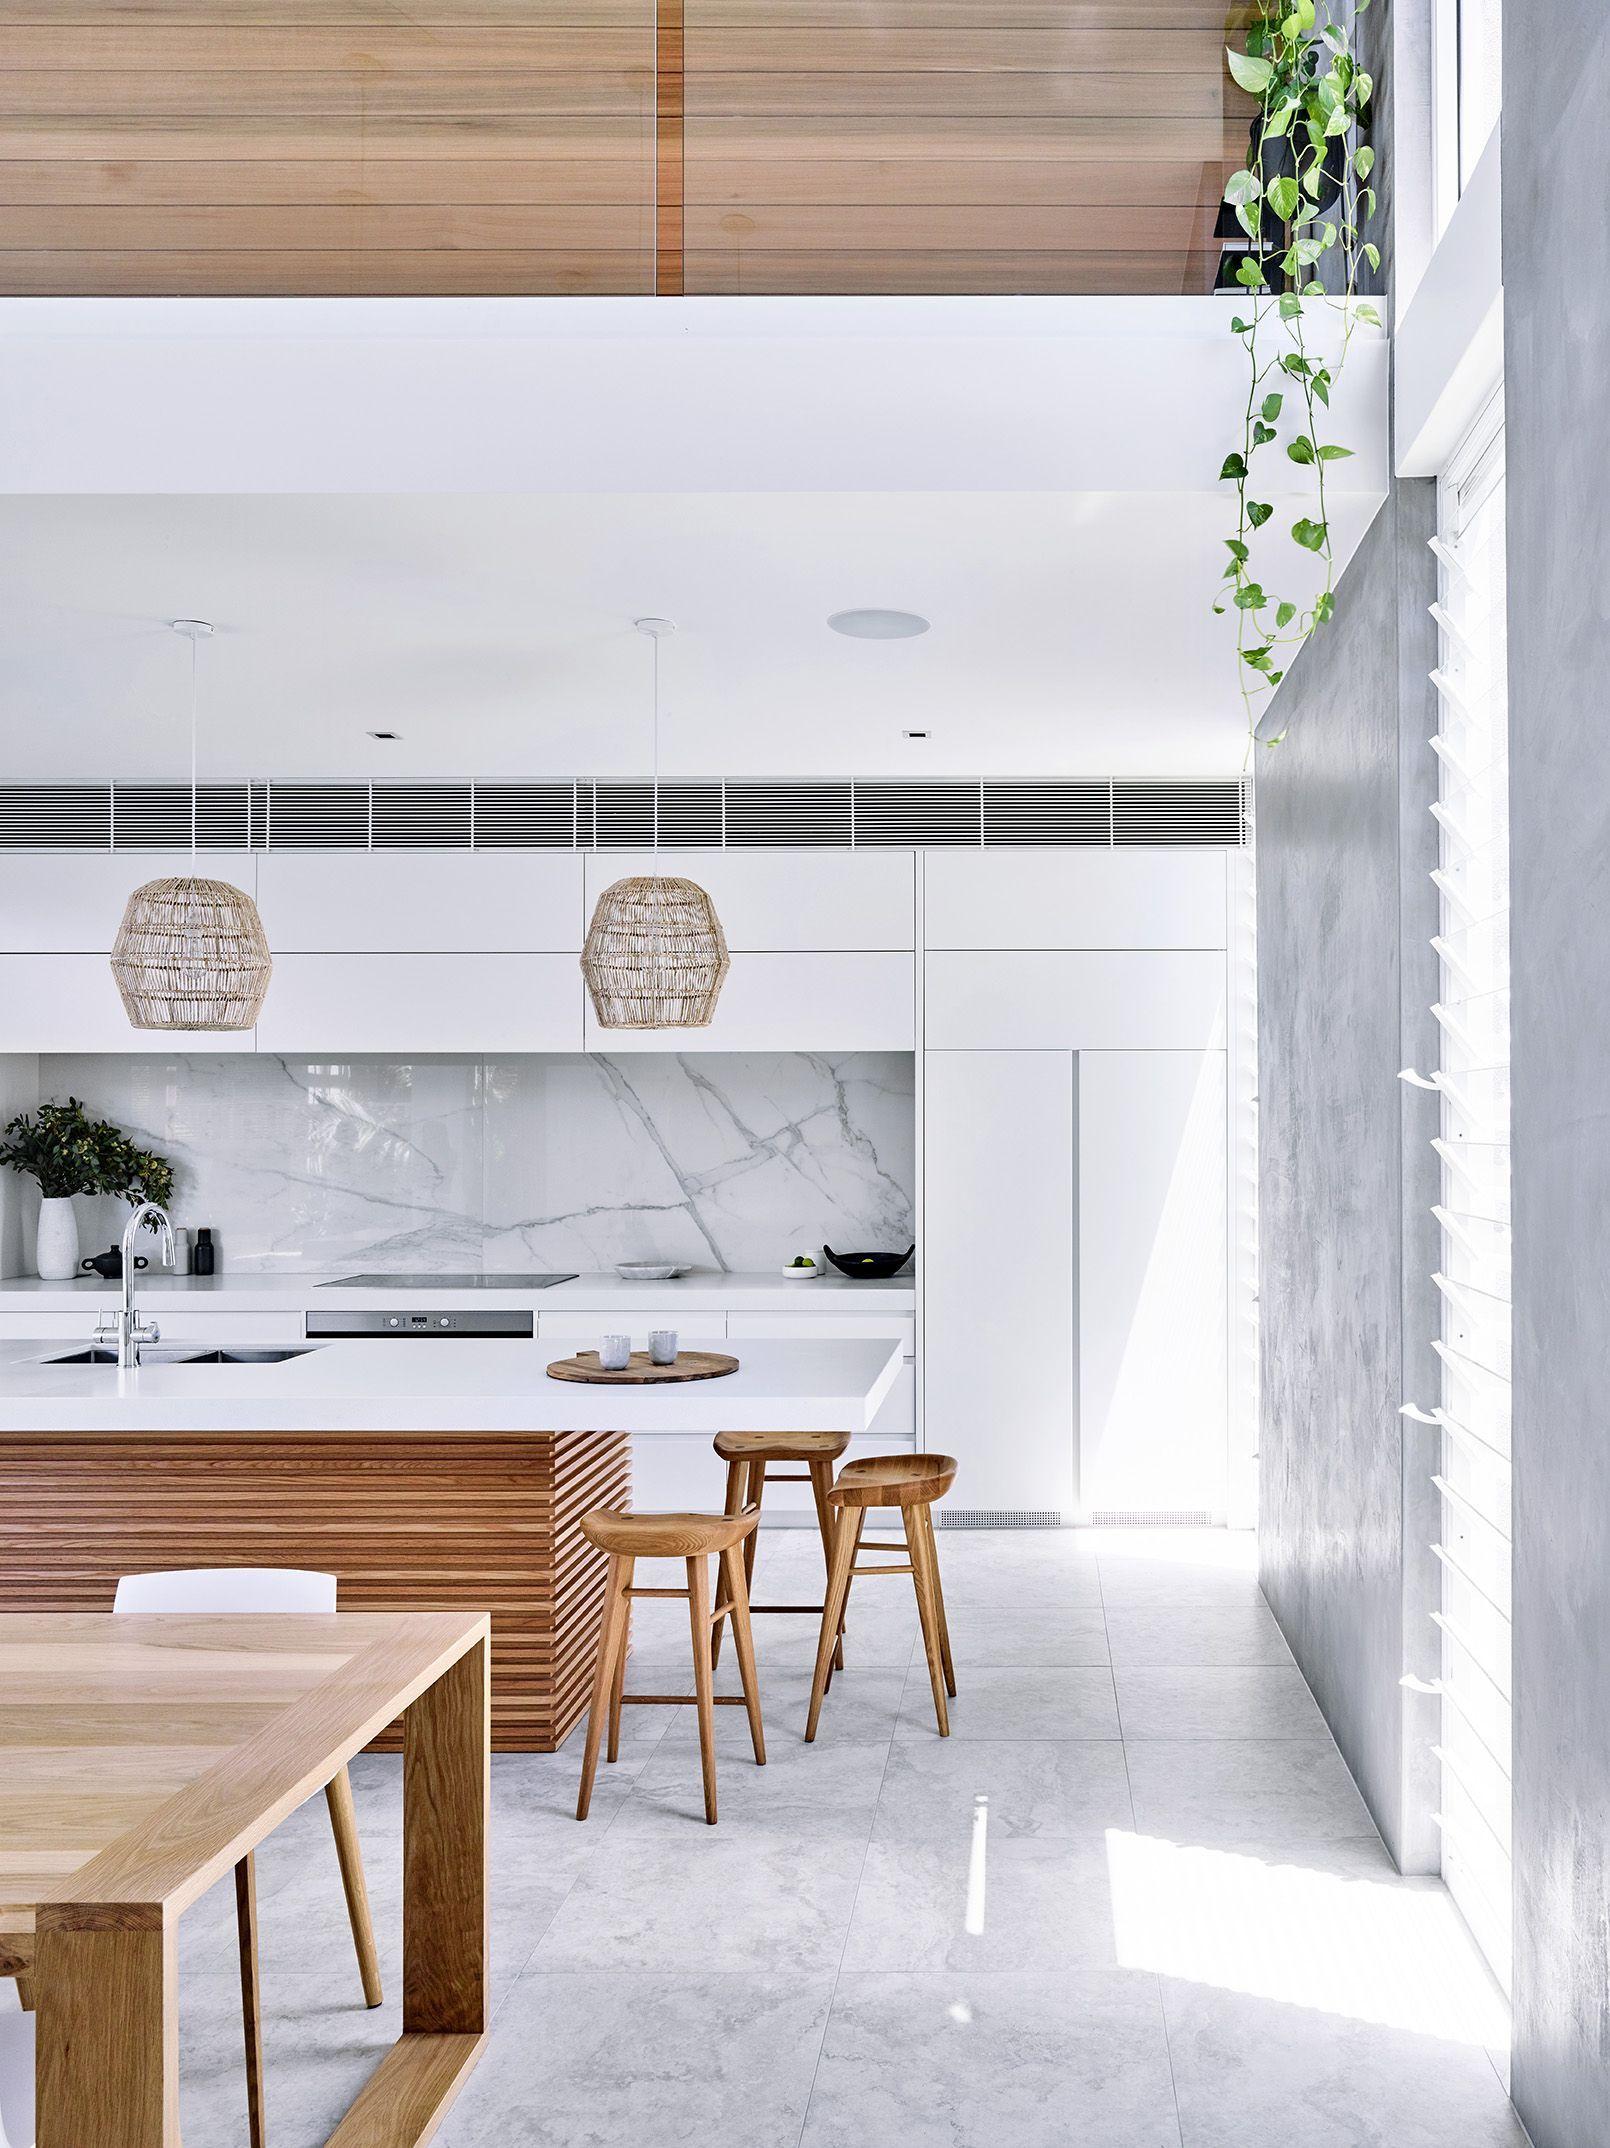 pilati interior design  all the good reasons to visit in